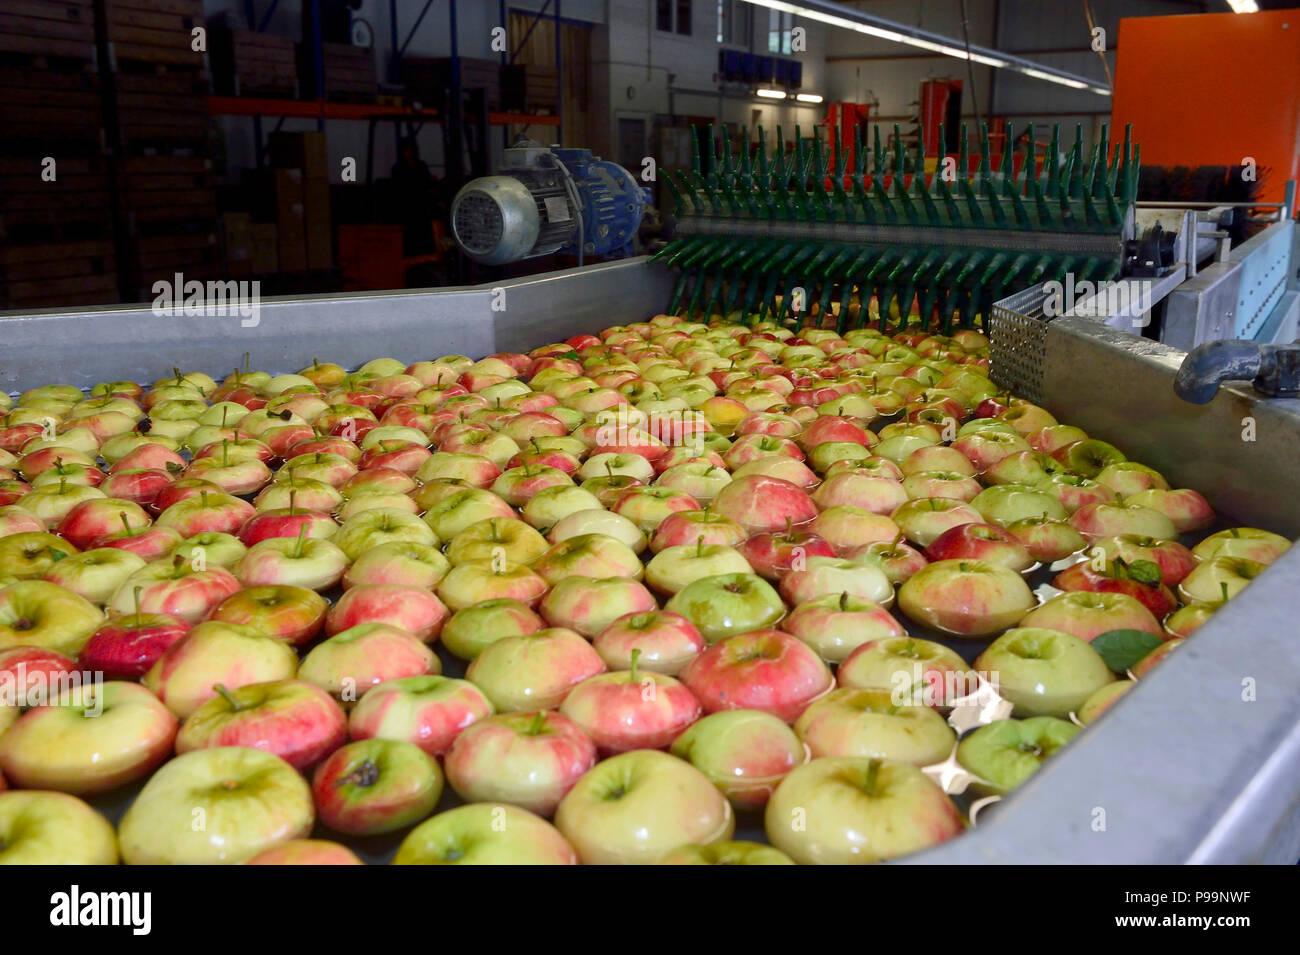 Germany, North Rhine-Westphalia - apple harvest in Neukirchen-Vluyn - Stock Image